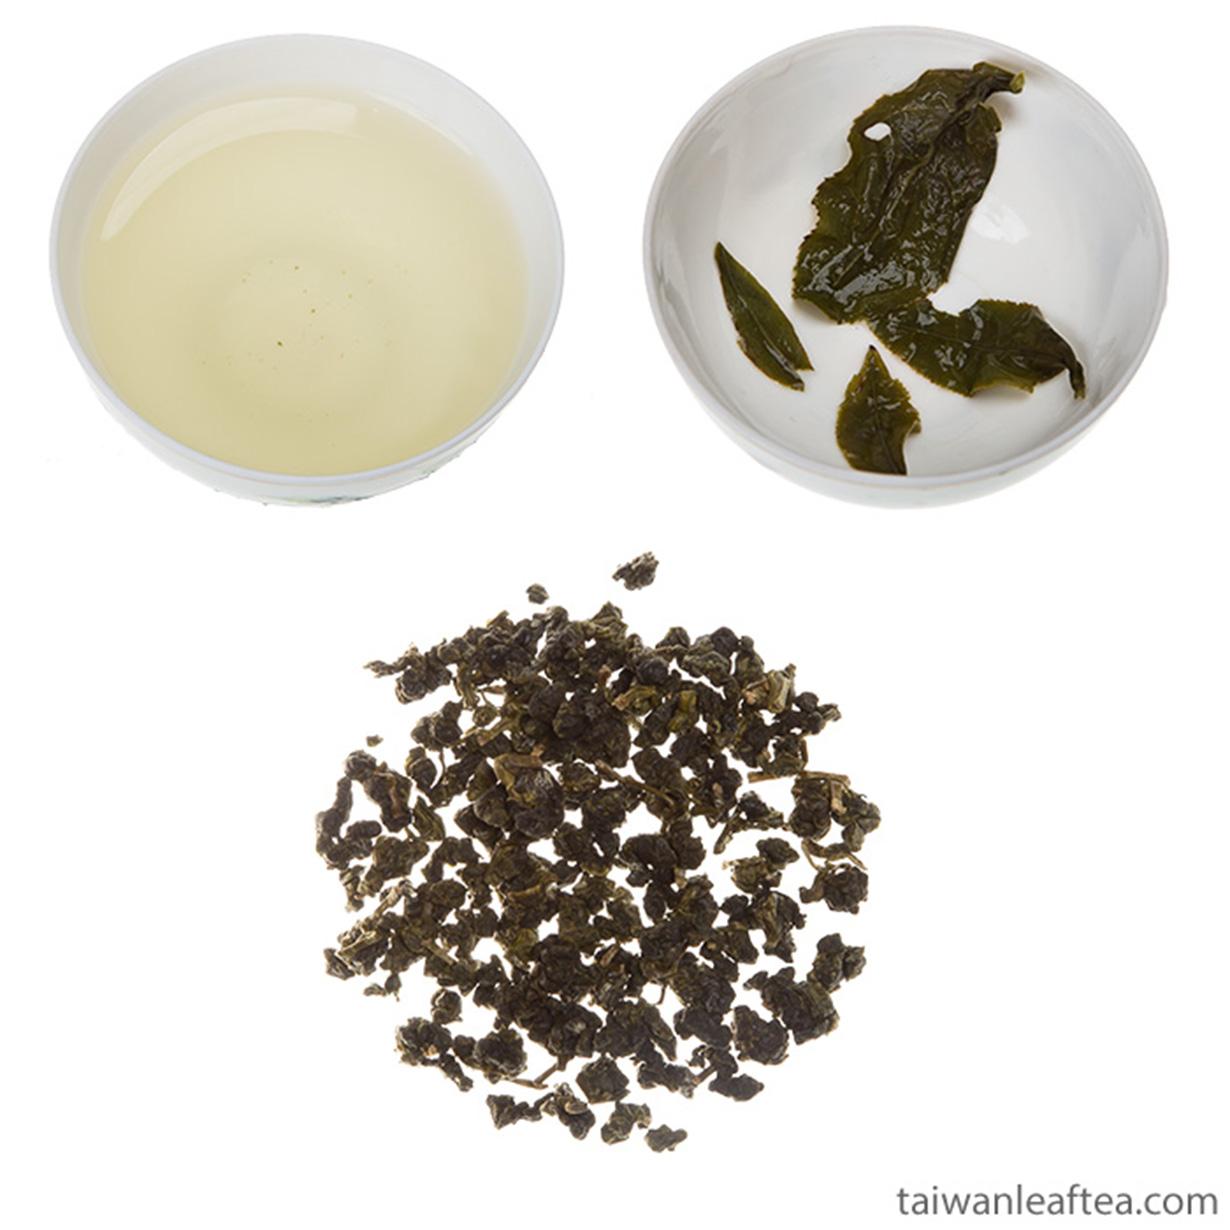 Watch How to Prepare Oolong Tea video